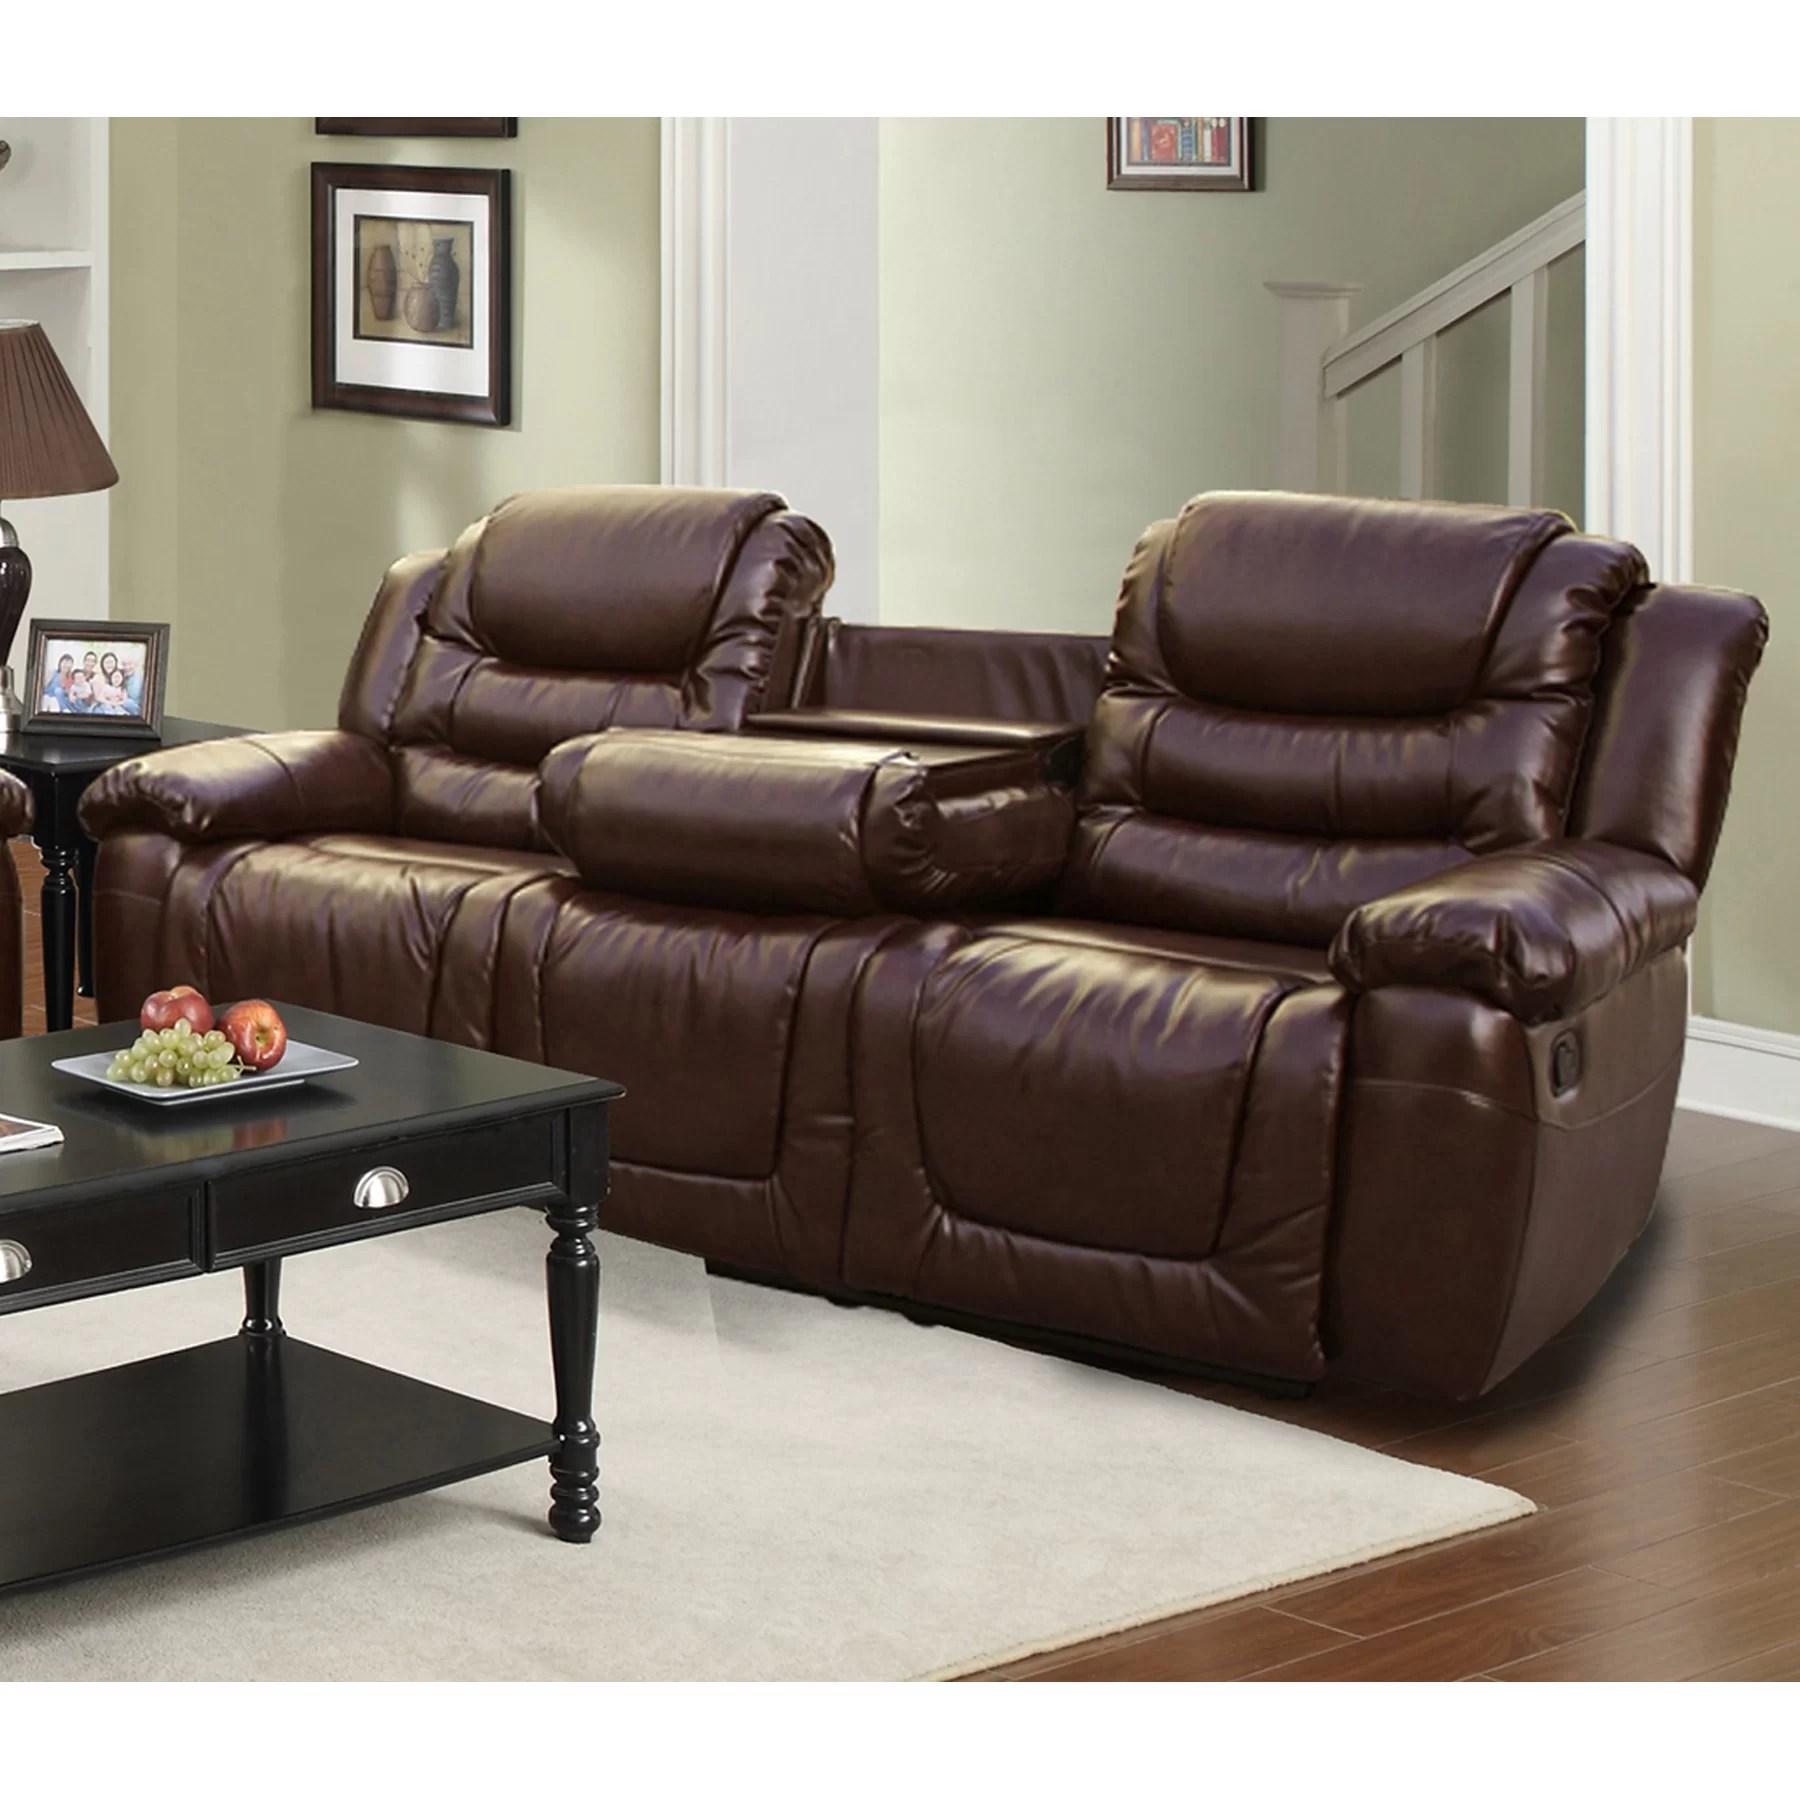 sectional sofas kijiji calgary friheten corner sofa bed bomstad black review set ottawa brokeasshome